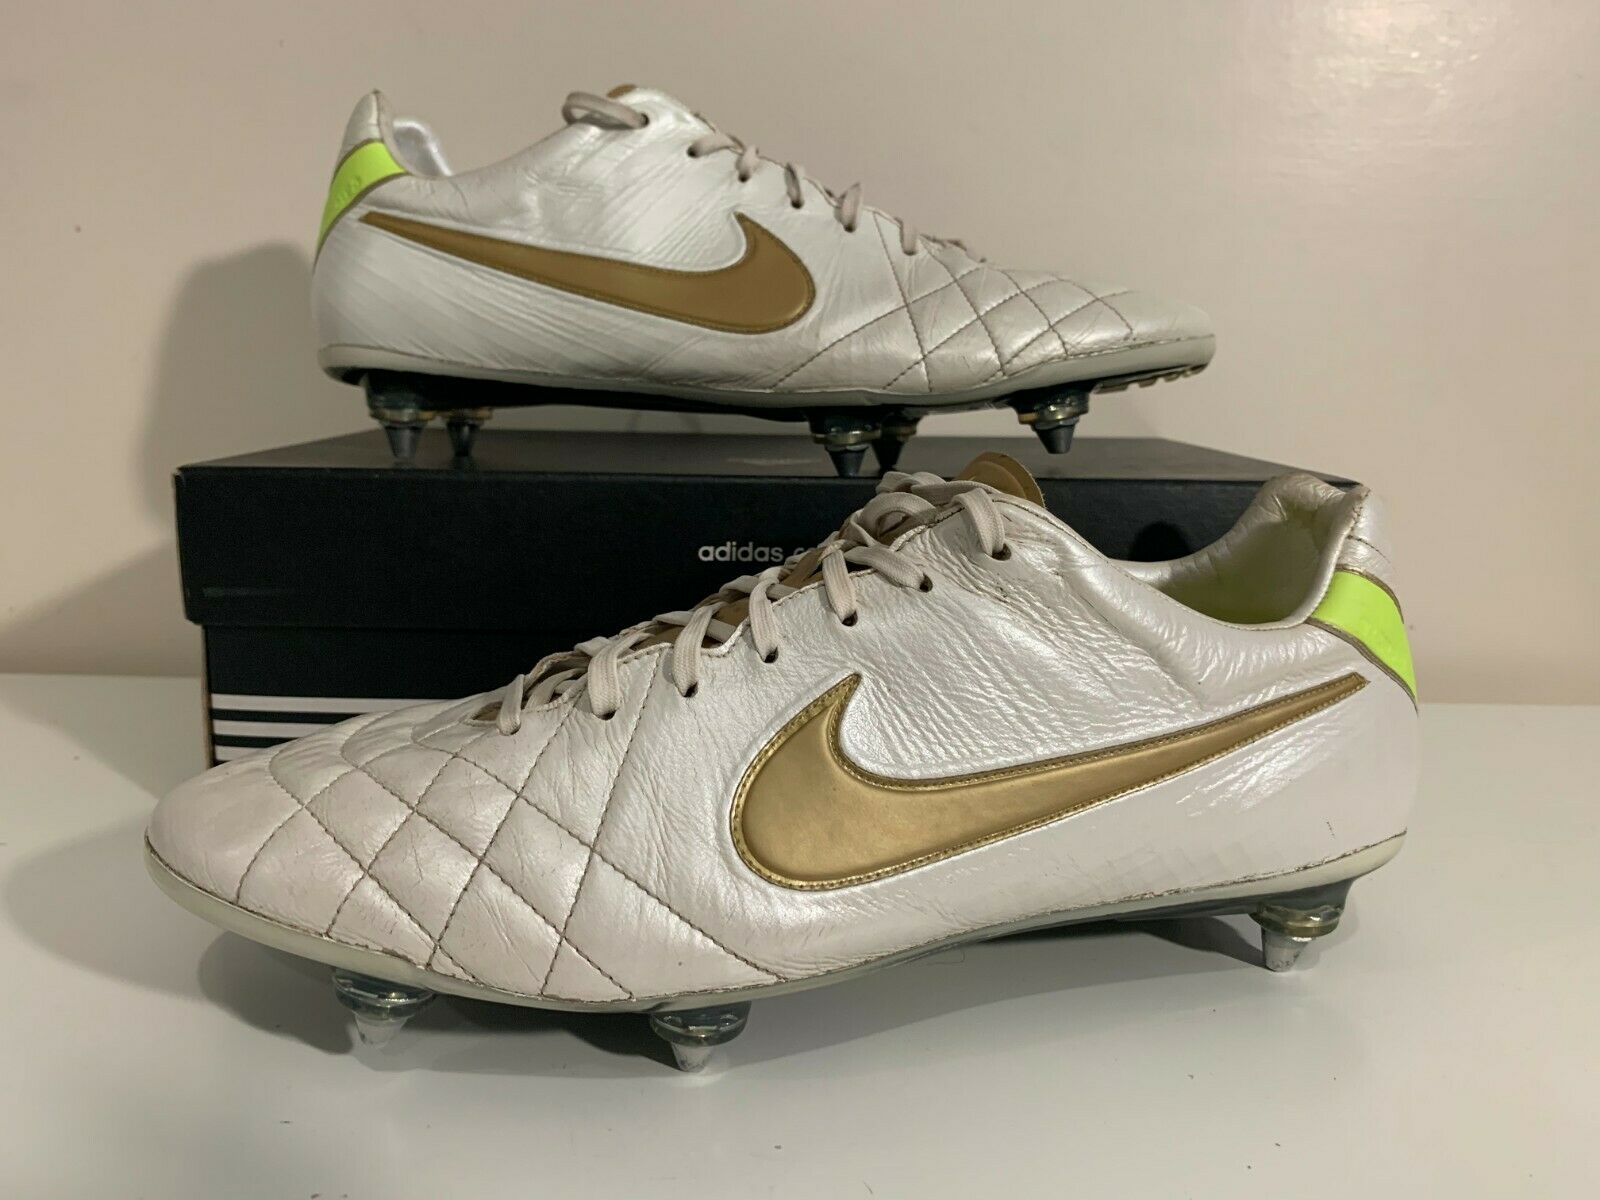 Nike Tiempo Legend Elite blancoo T90 Fútbol Zapatos 10,5 11,5 45,5